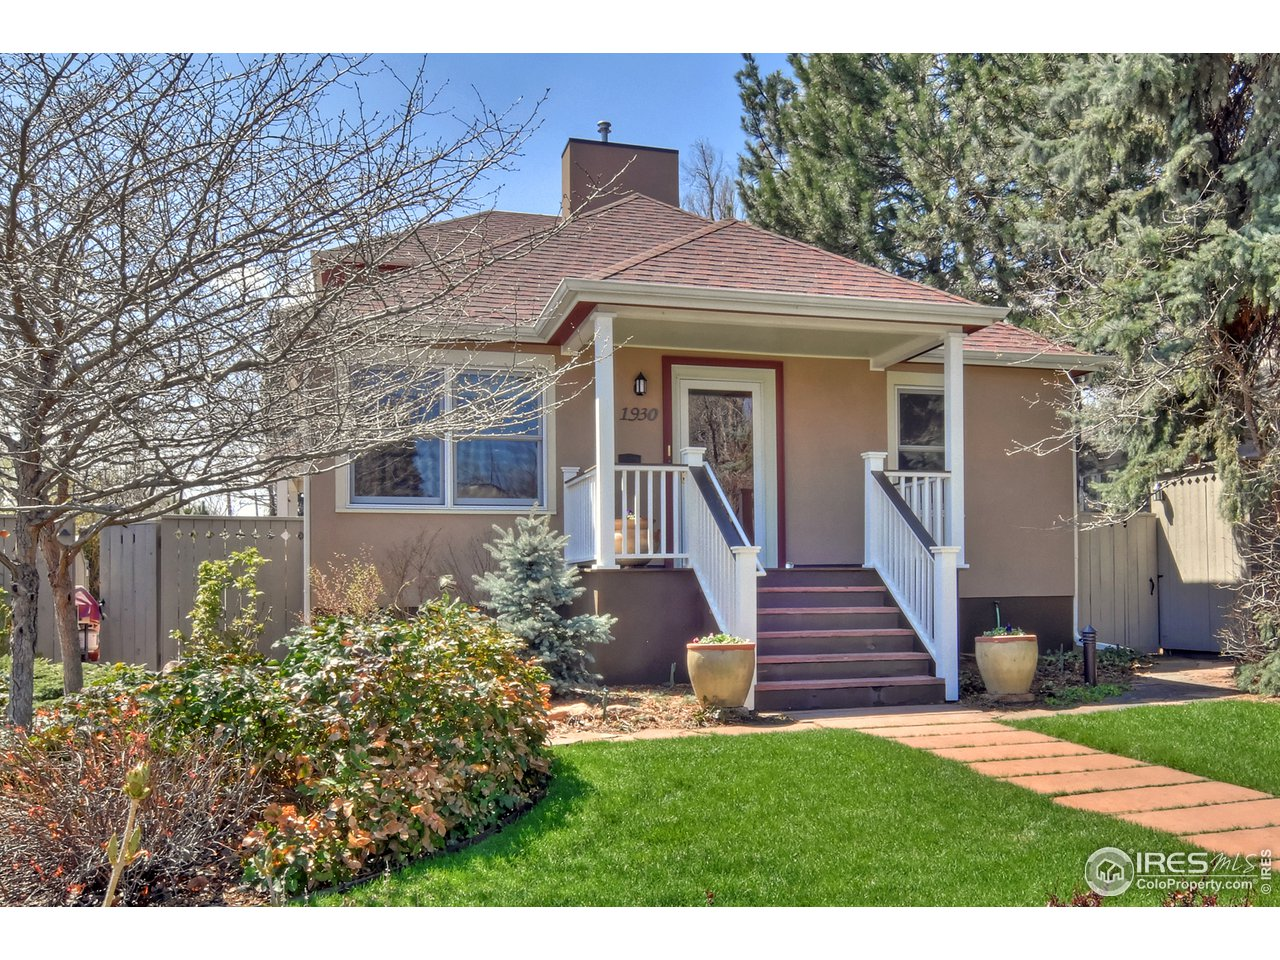 1930 Columbine Ave, Boulder CO 80302